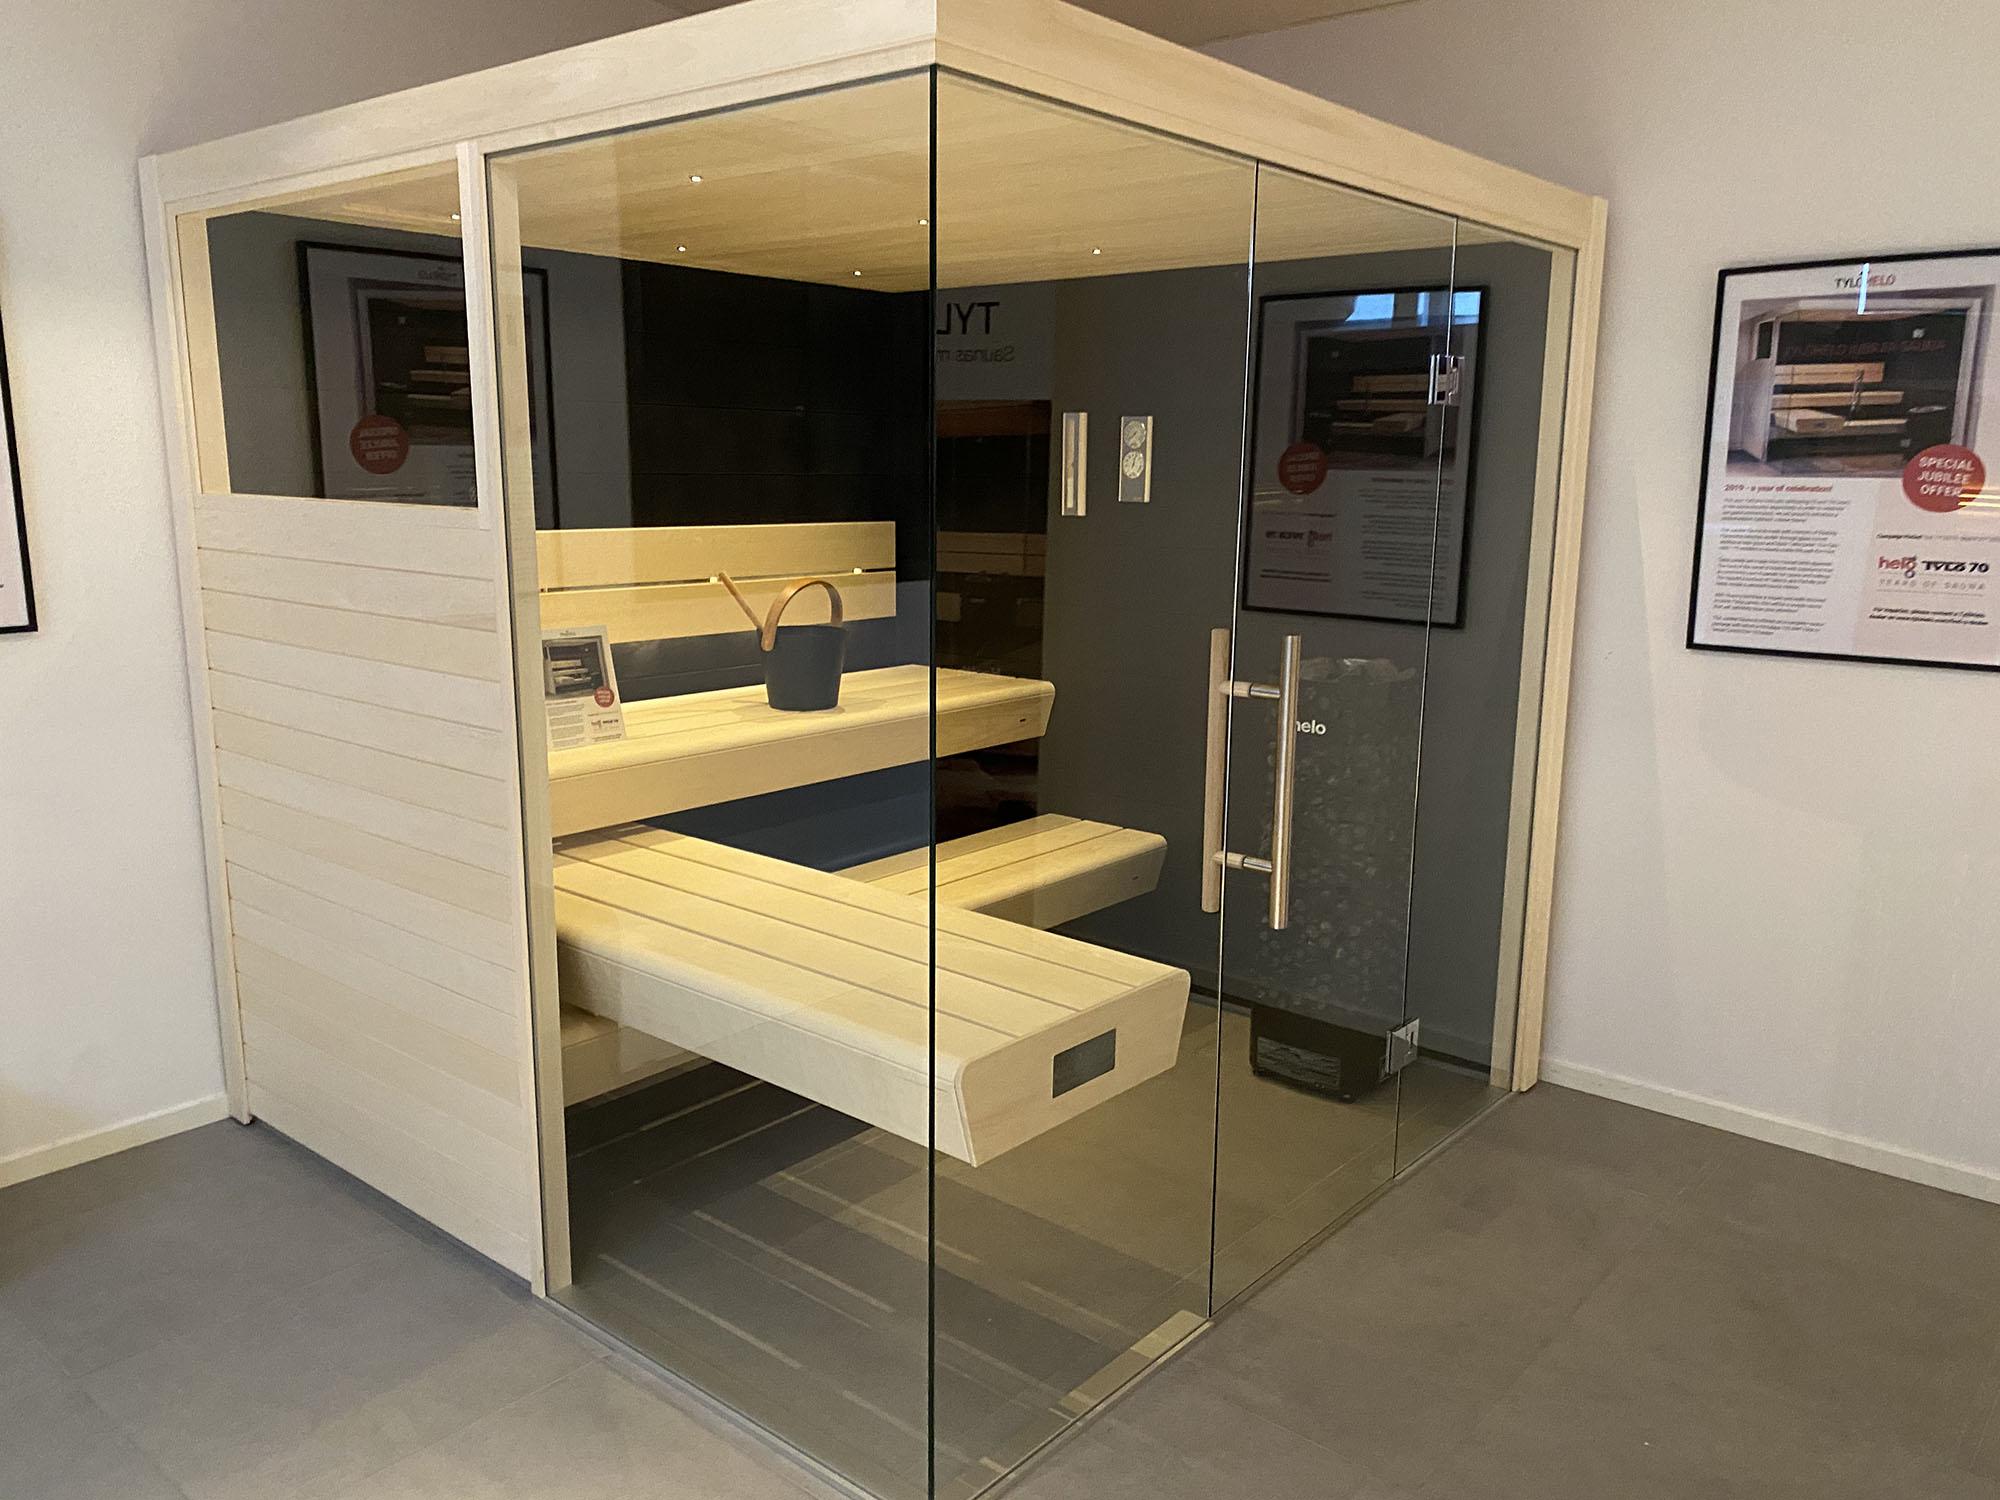 kabina sauny na wymiar